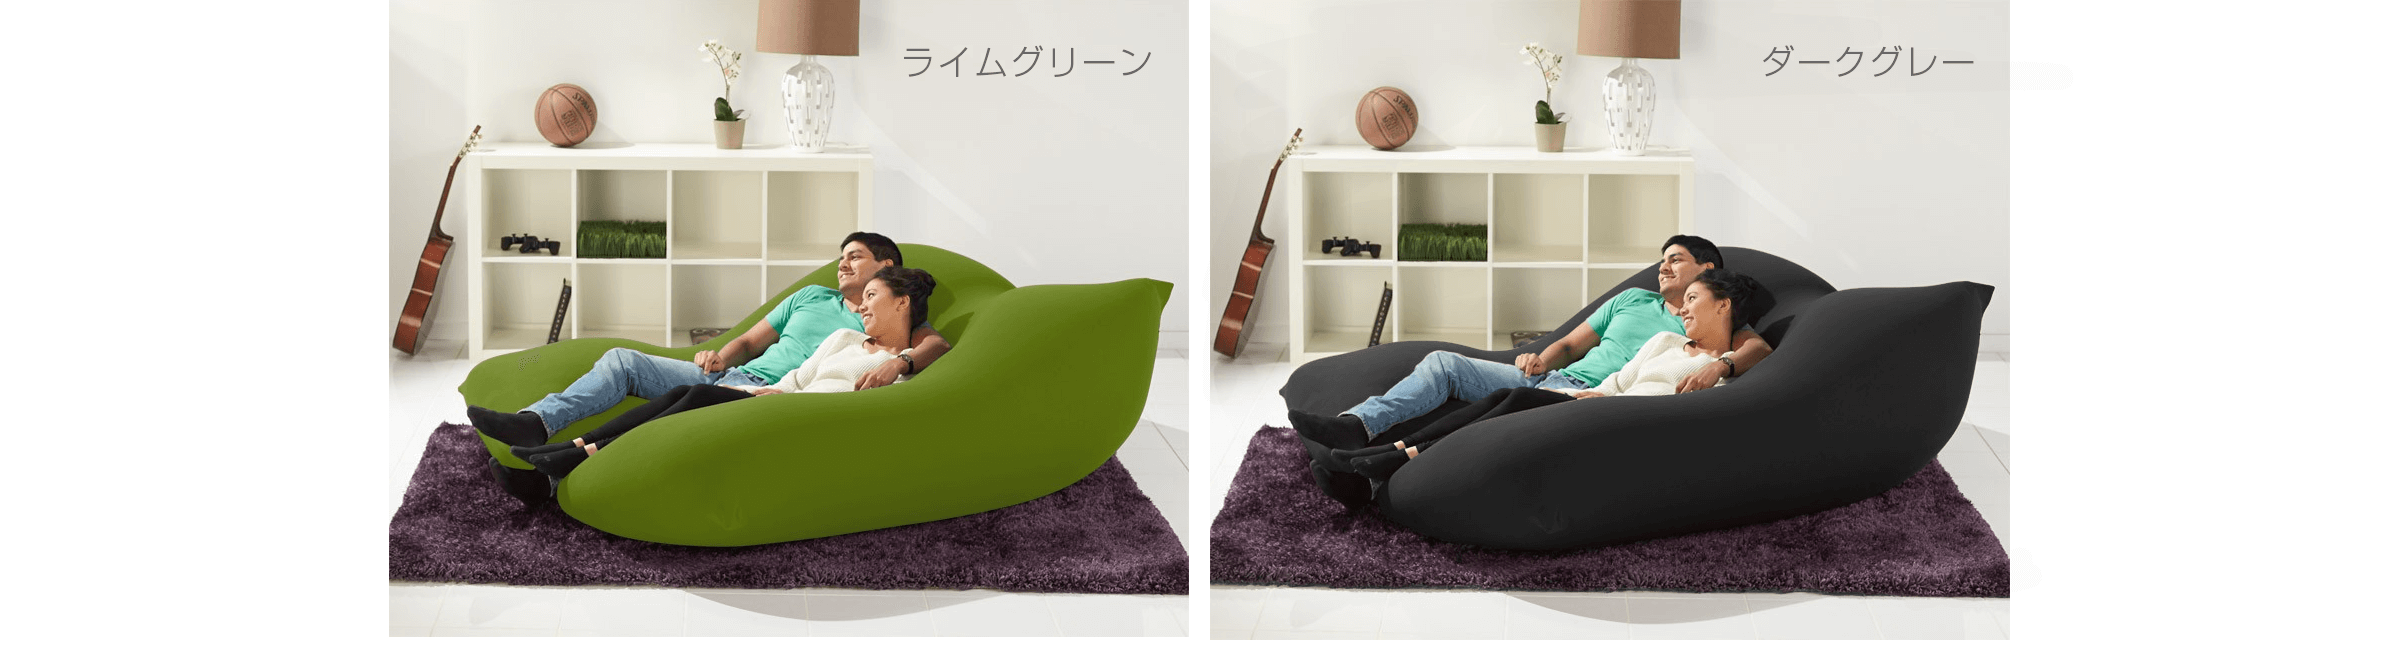 Yogibo Double(ヨギボー・ダブル) ライムグリーン ダークグレー